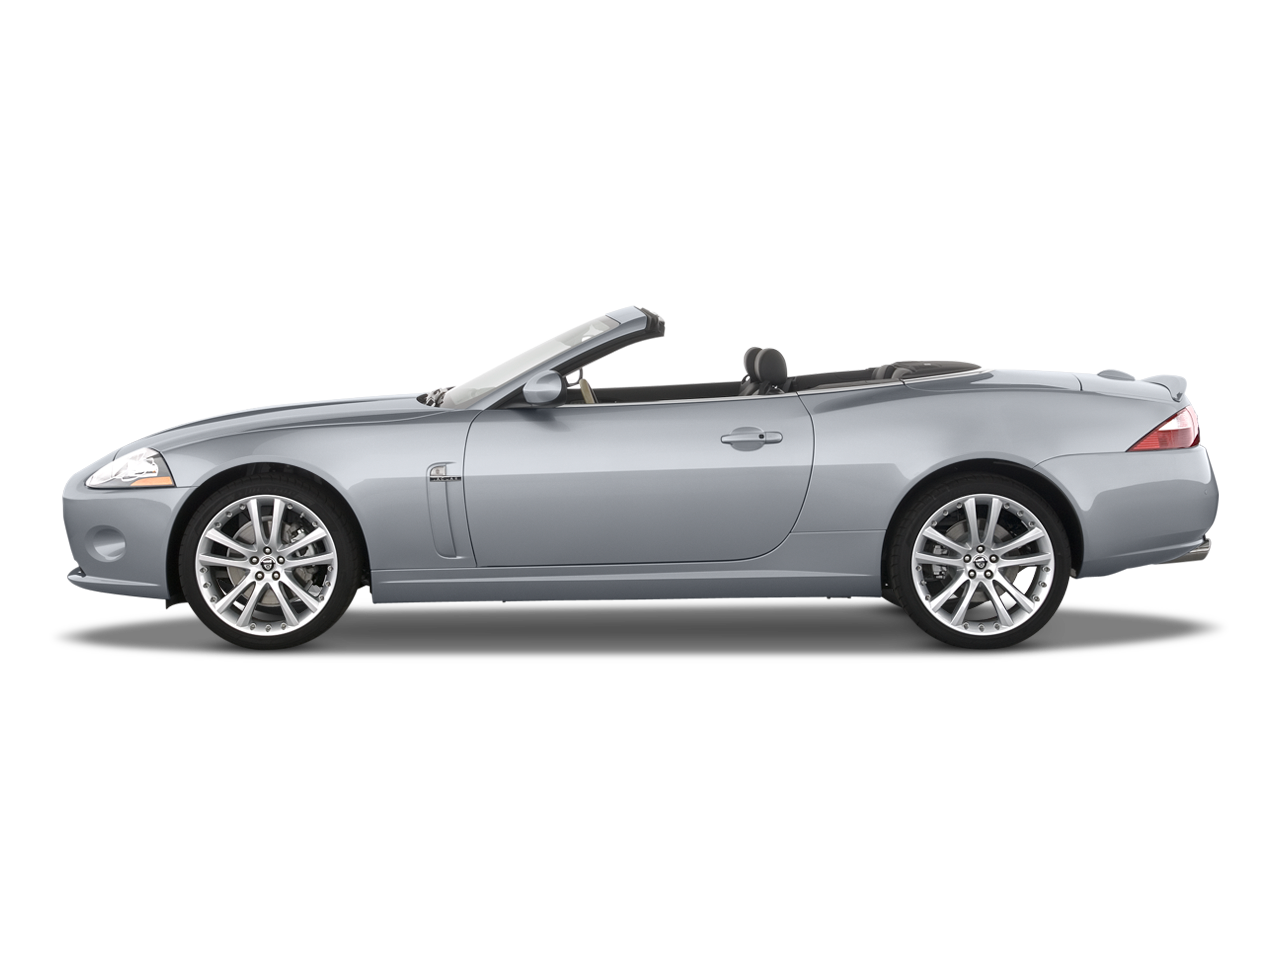 2008 Jaguar XKR Convertible - Jaguar Luxury Convertible ...